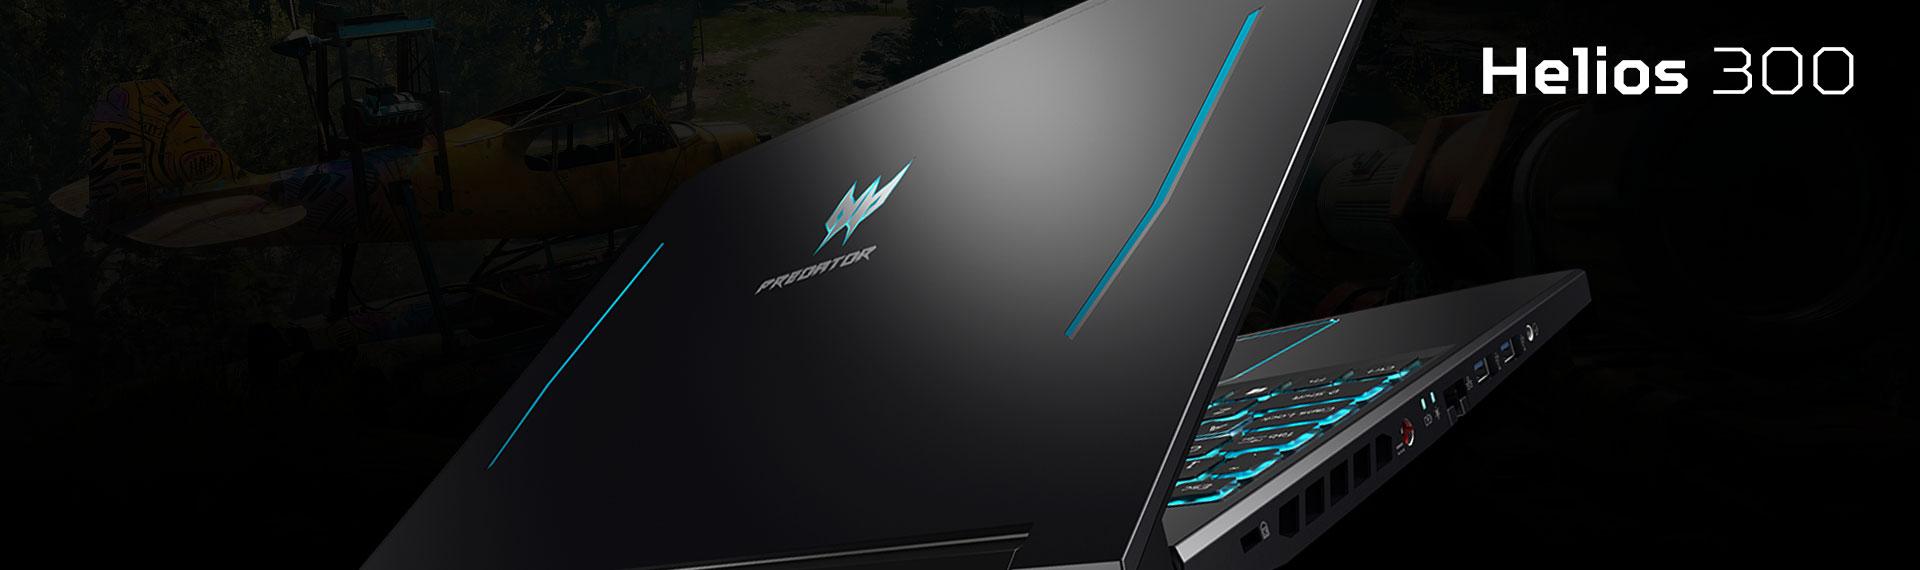 Predator Helios 300 Intel 9th Gen Sebagai Laptop Gaming Powerful!